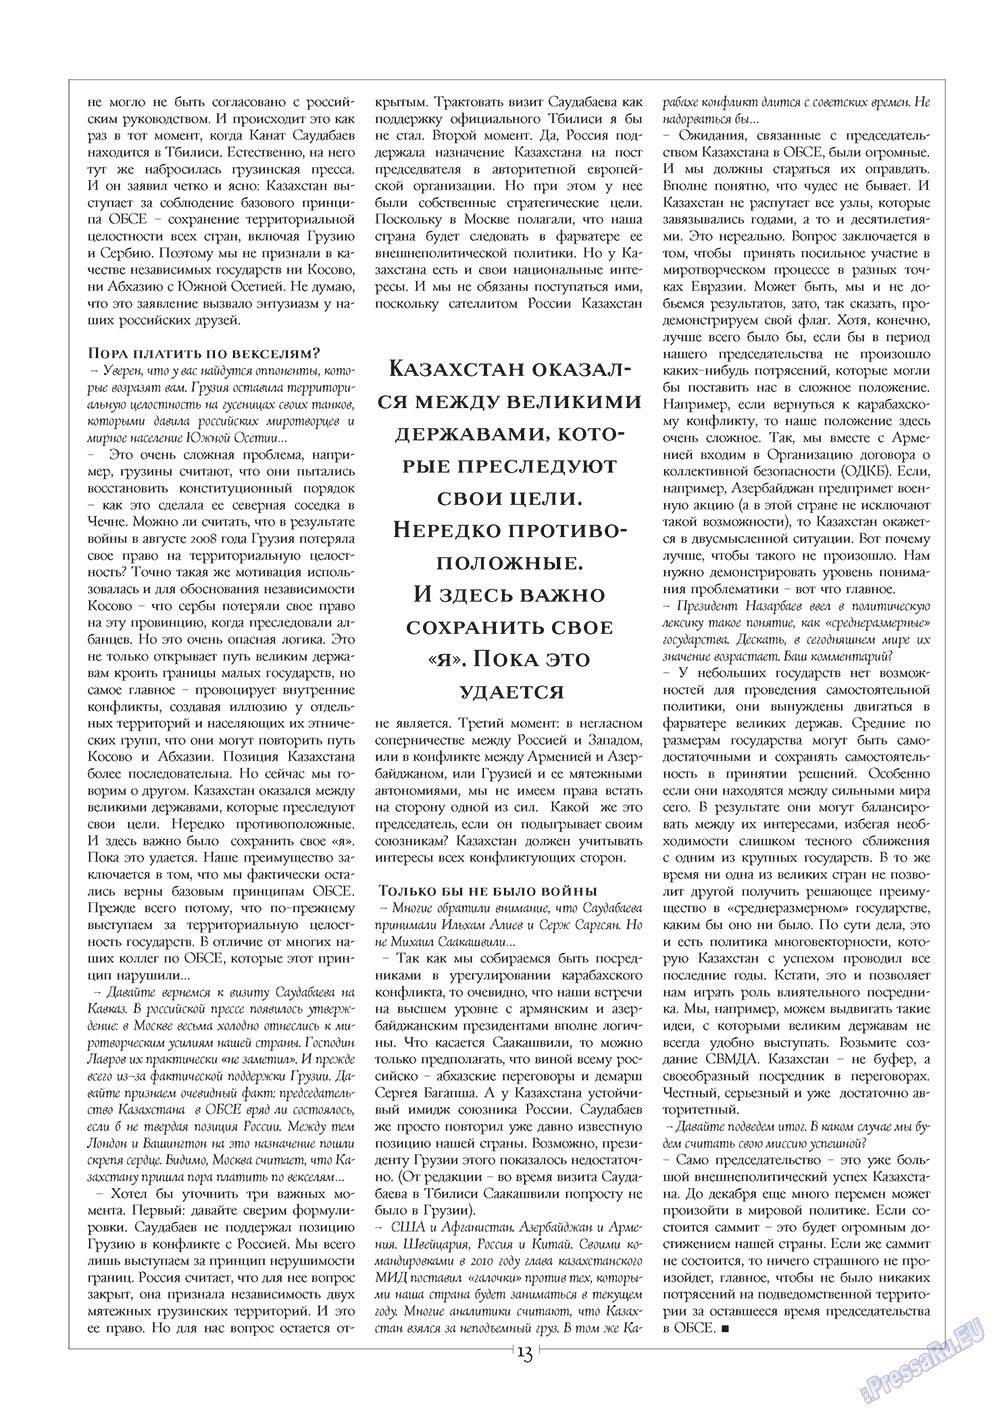 Европейский меридиан (журнал). 2010 год, номер 2, стр. 13